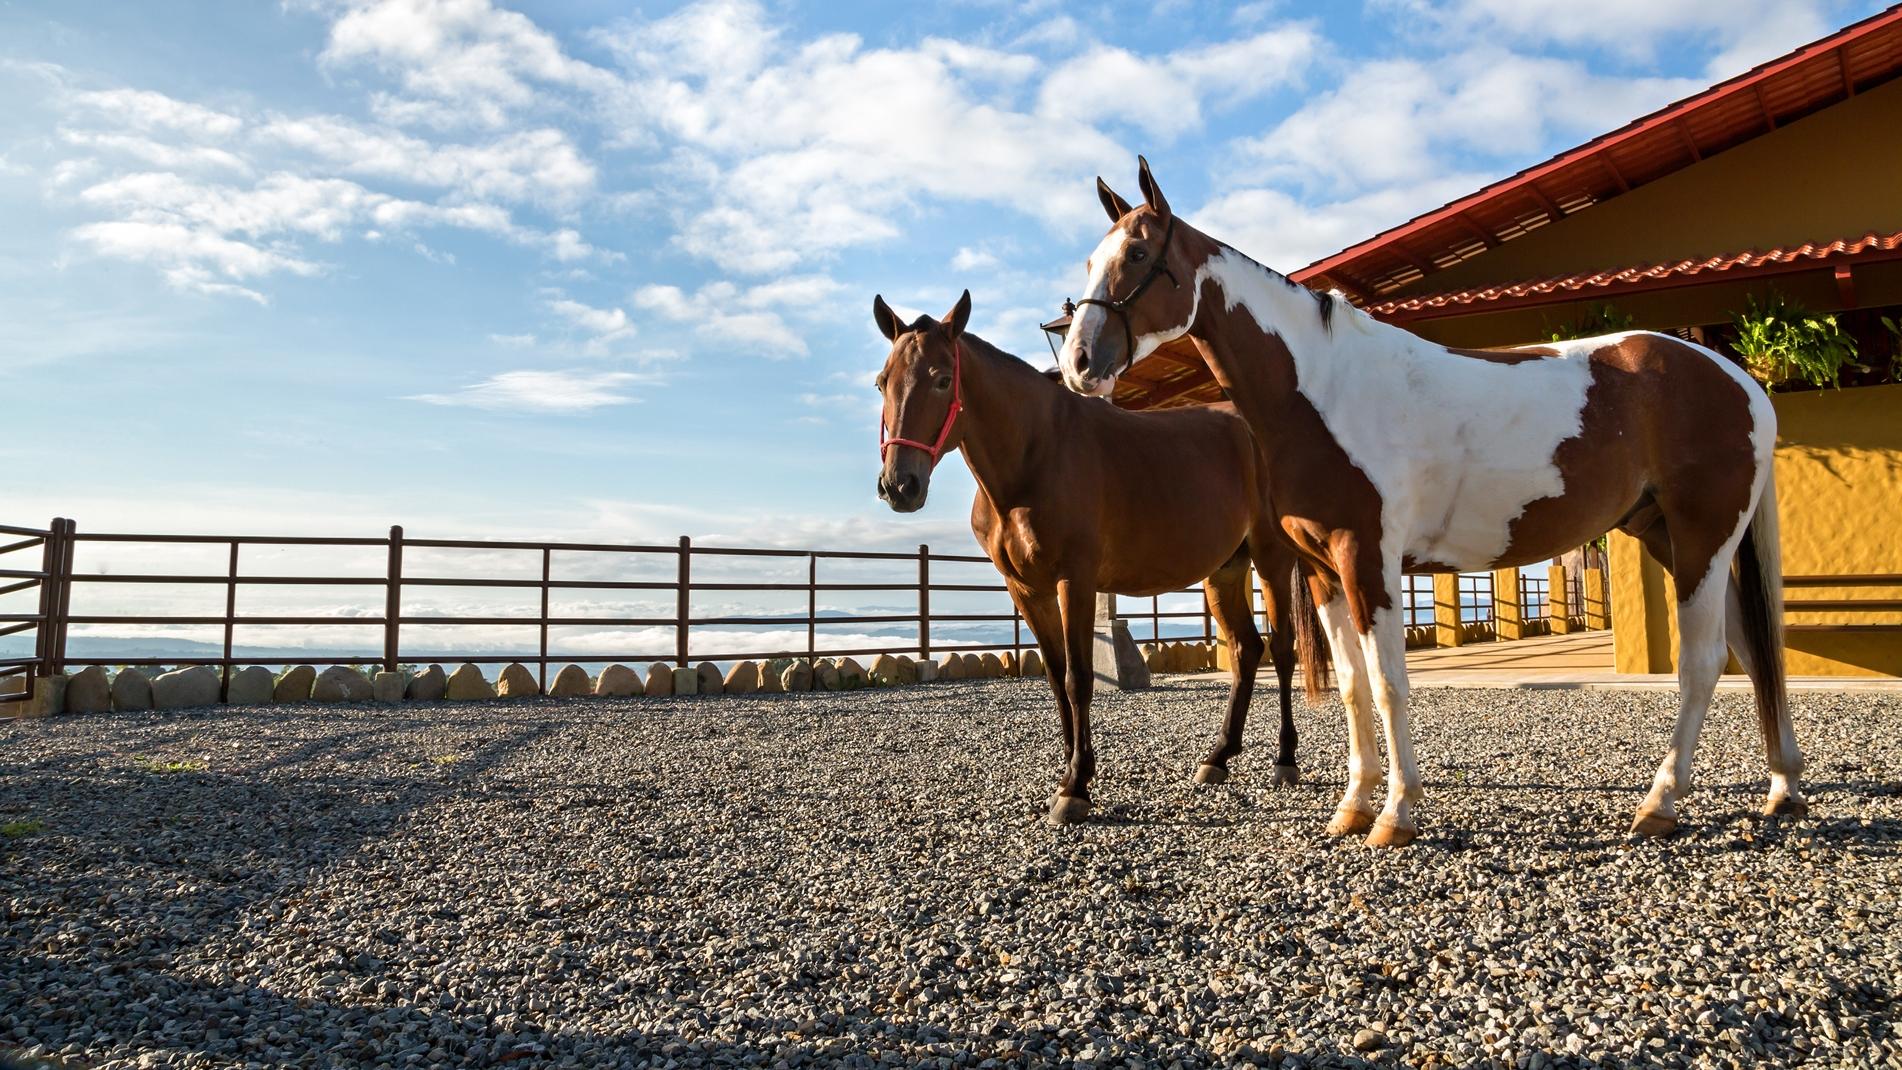 Equestrian-Experience-Breed-Horses.jpg